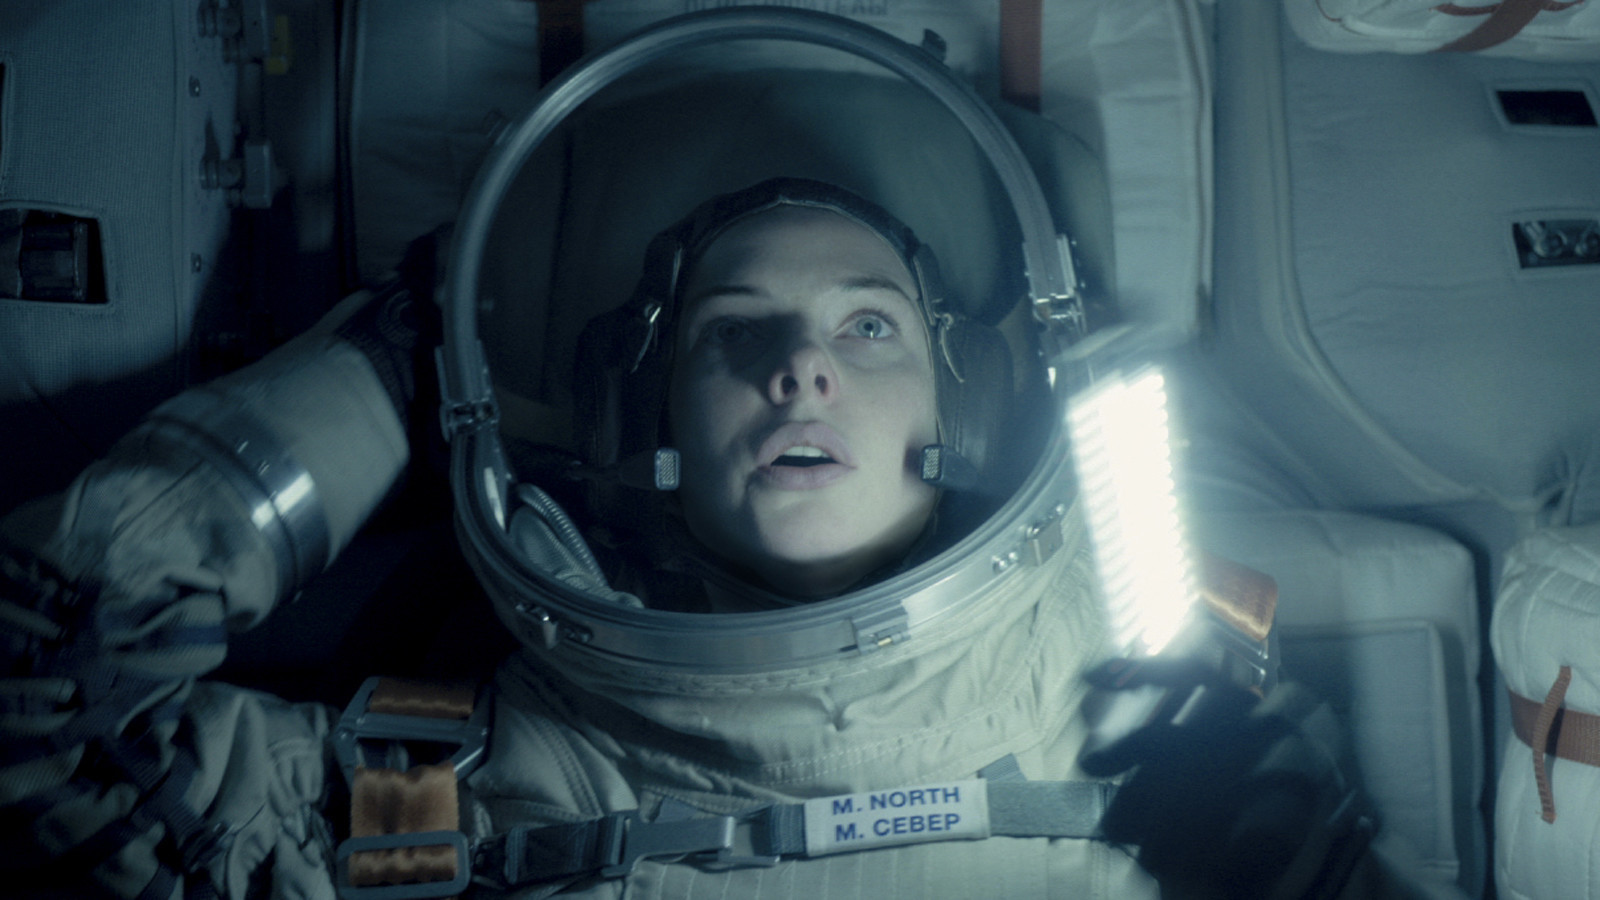 'Alien' haunts outer space thriller 'Life'